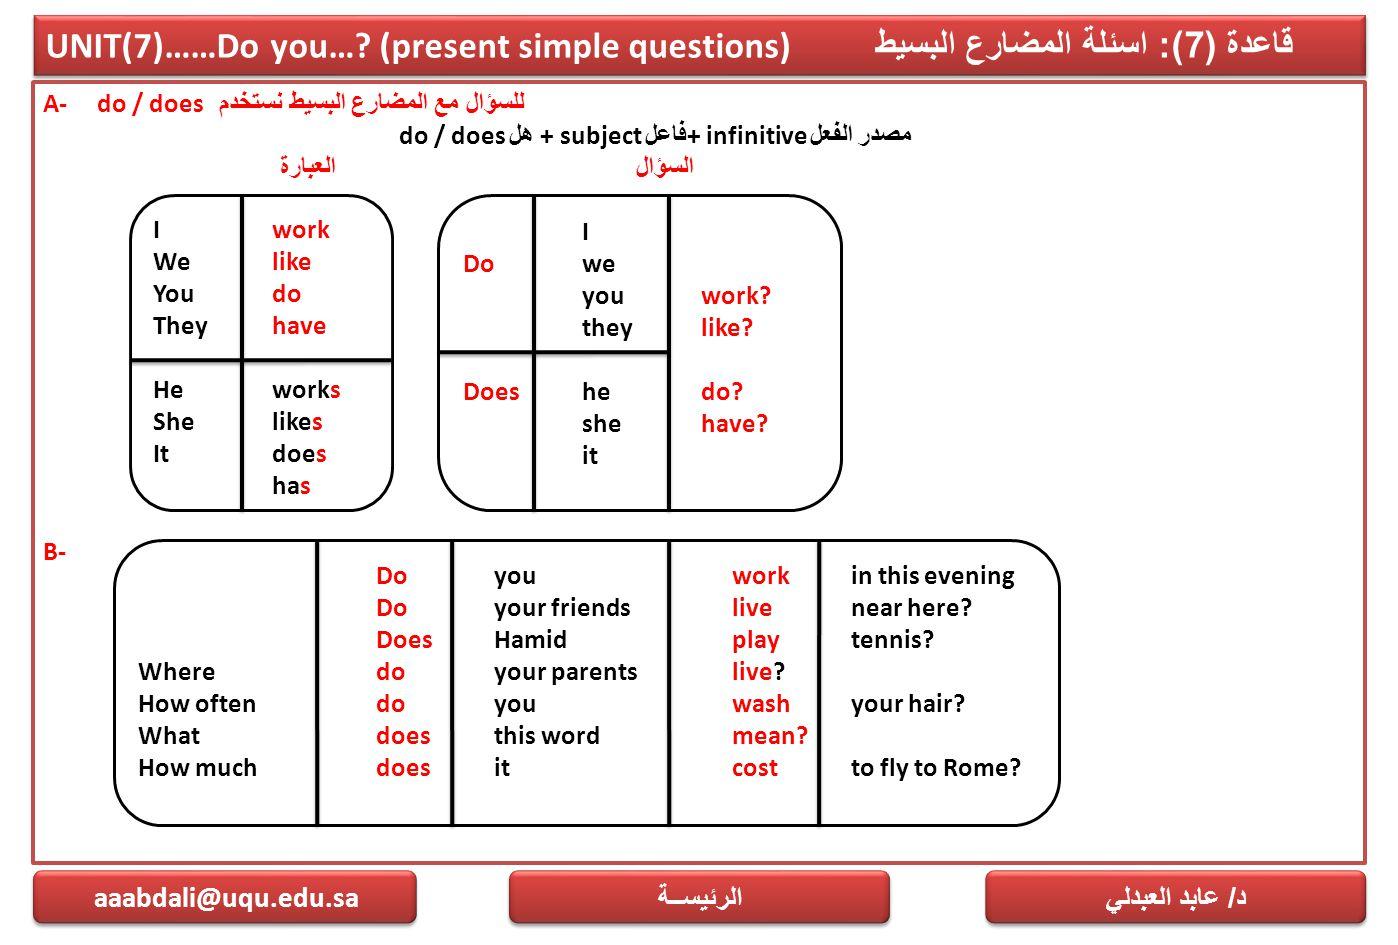 UNIT(7)……Do you…. (present simple questions)